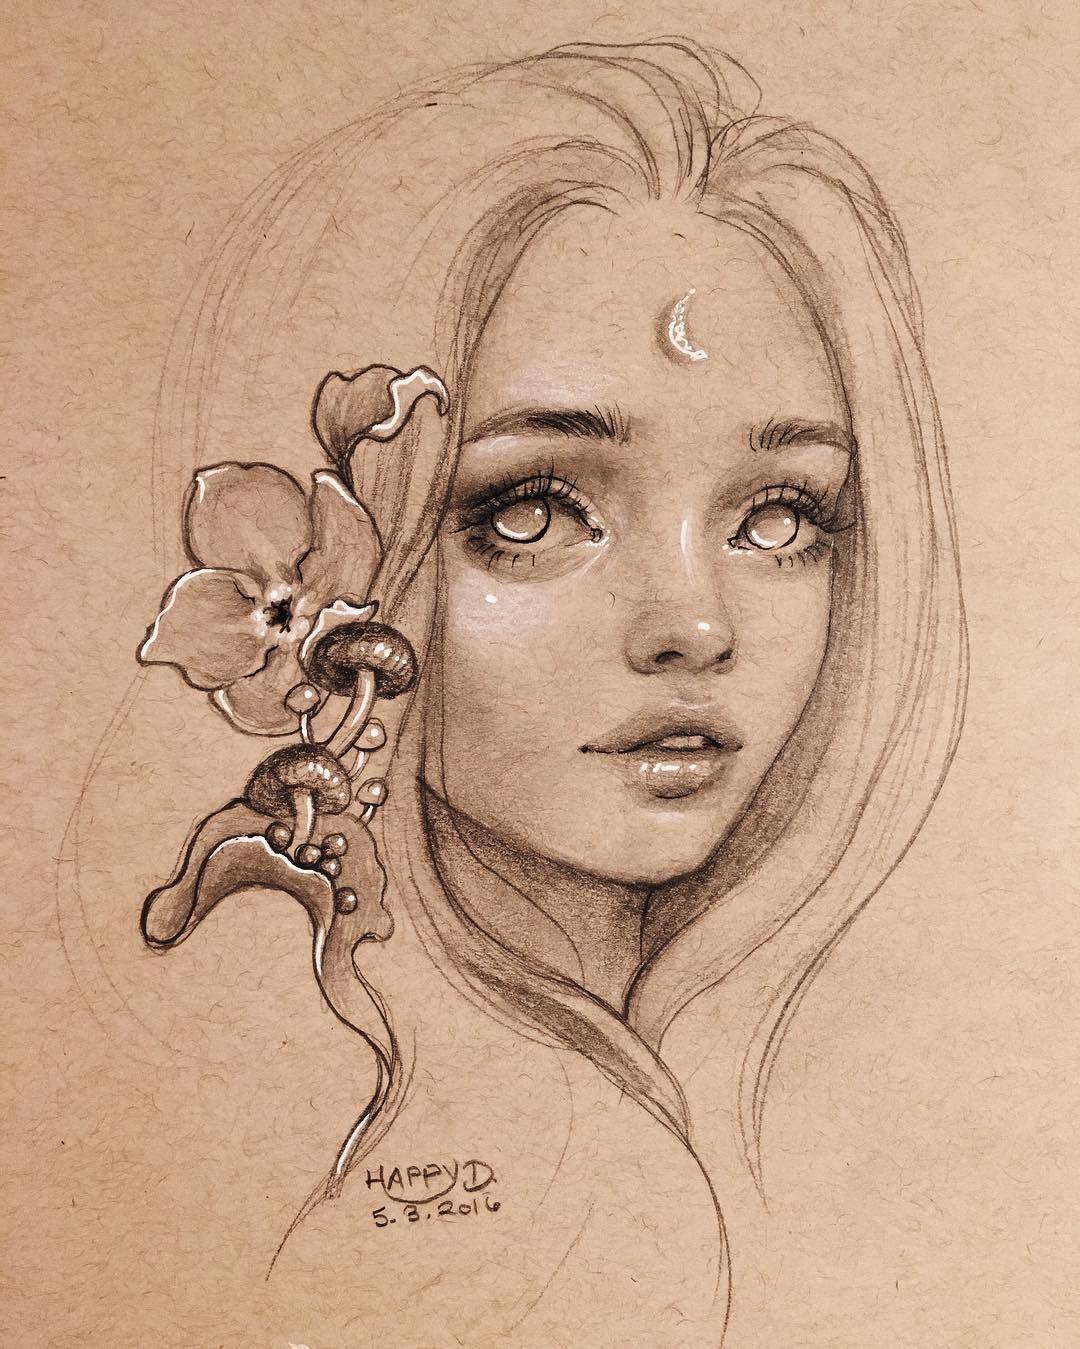 6 527 Vind Ik Leuks 49 Reacties Happy D Happydartist Op Instagram Finished Another Patreon Drawing Last Night With Images Happy D Artist Sketches Cool Drawings